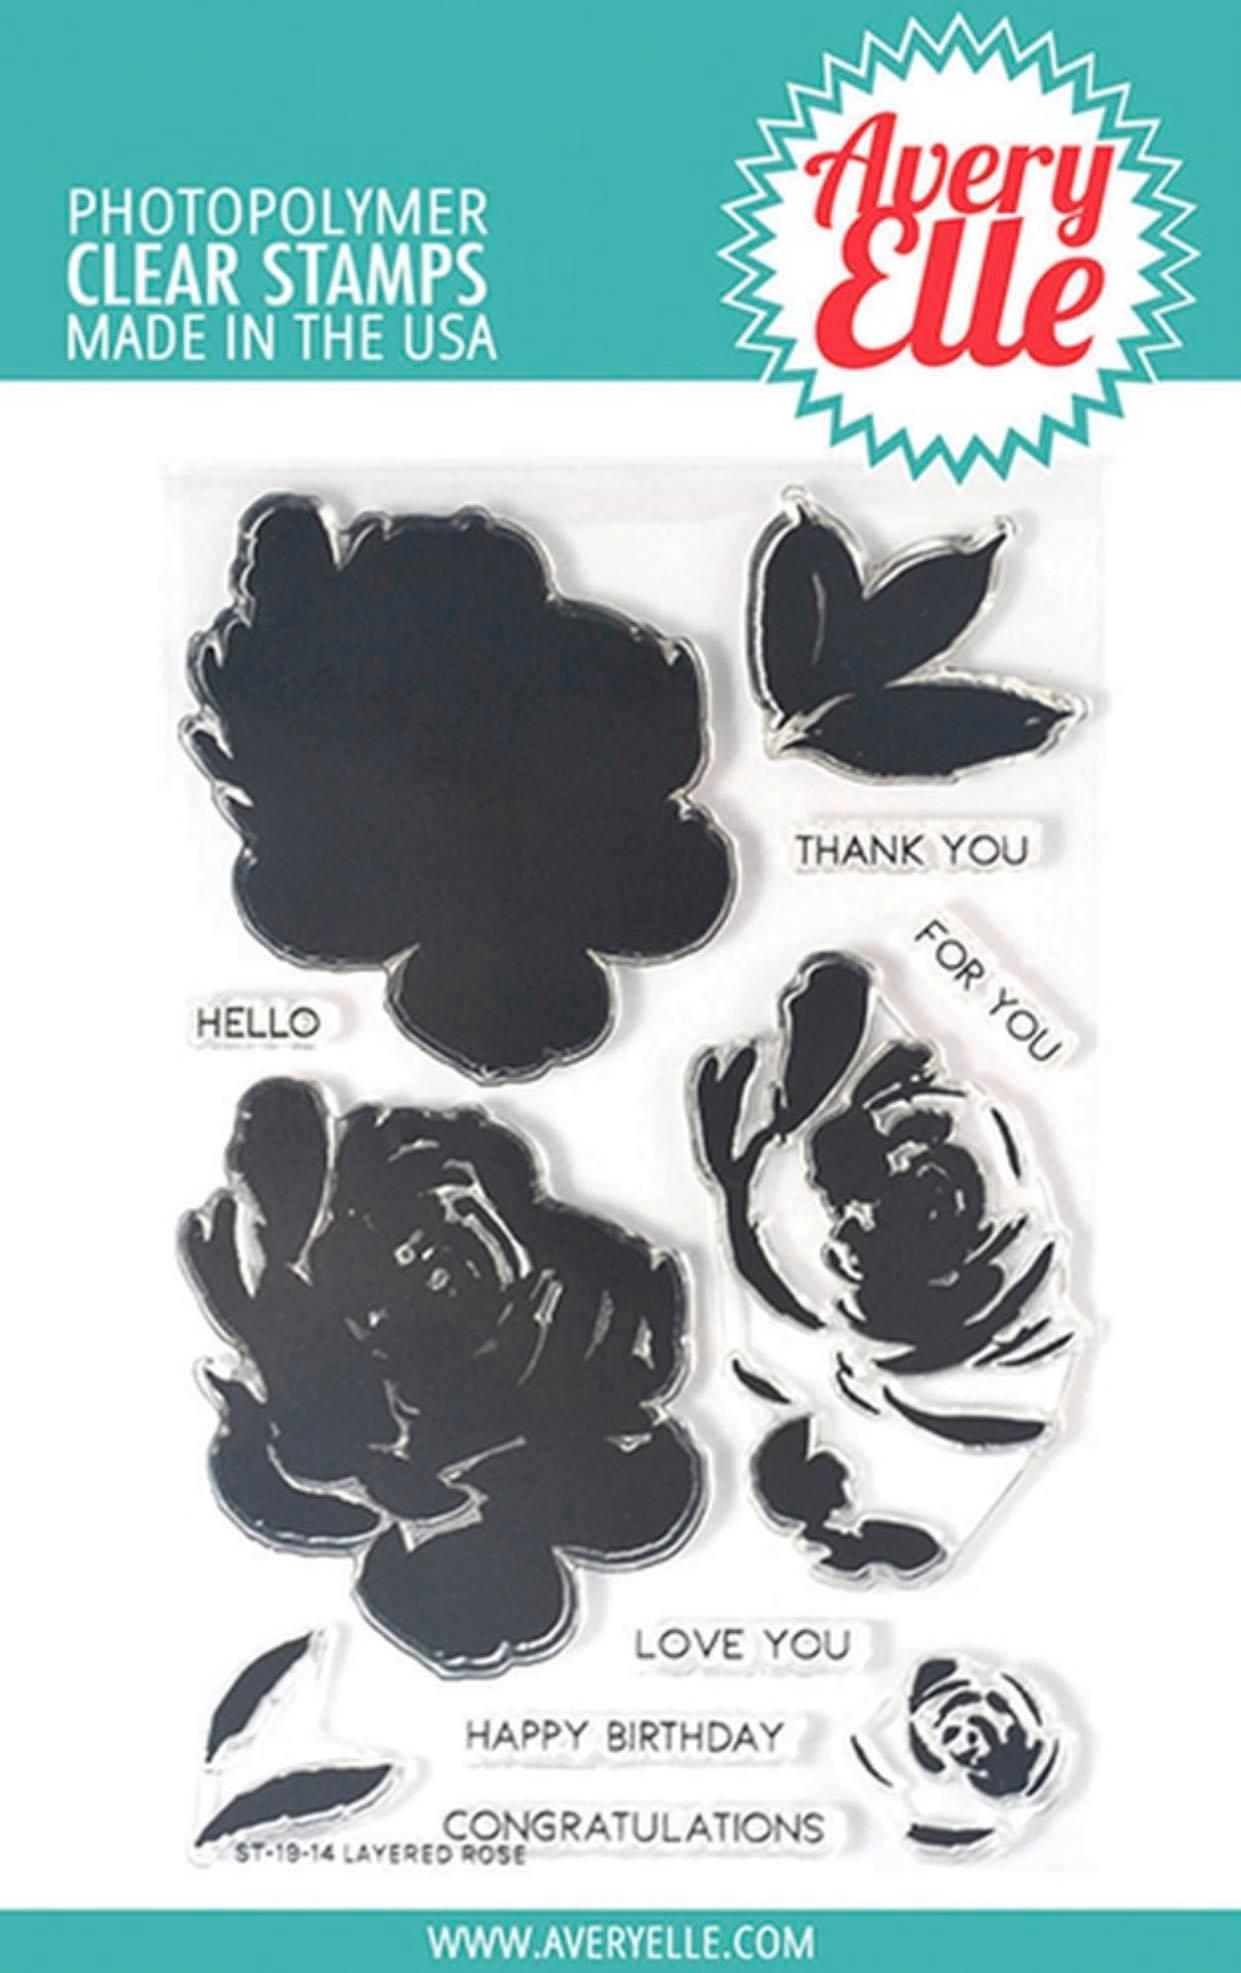 Avery Elle - Layered Rose Stamp Set